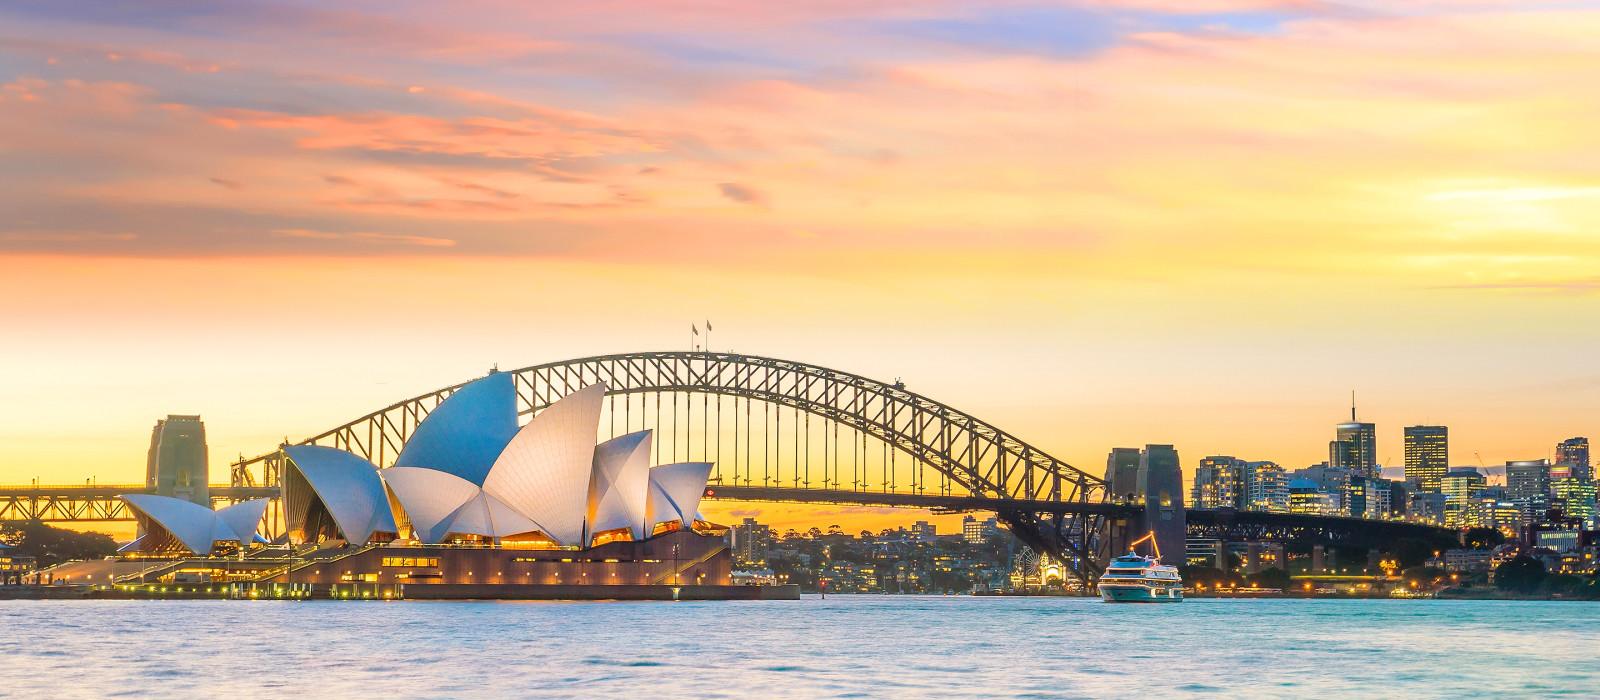 Destination Sydney Australia